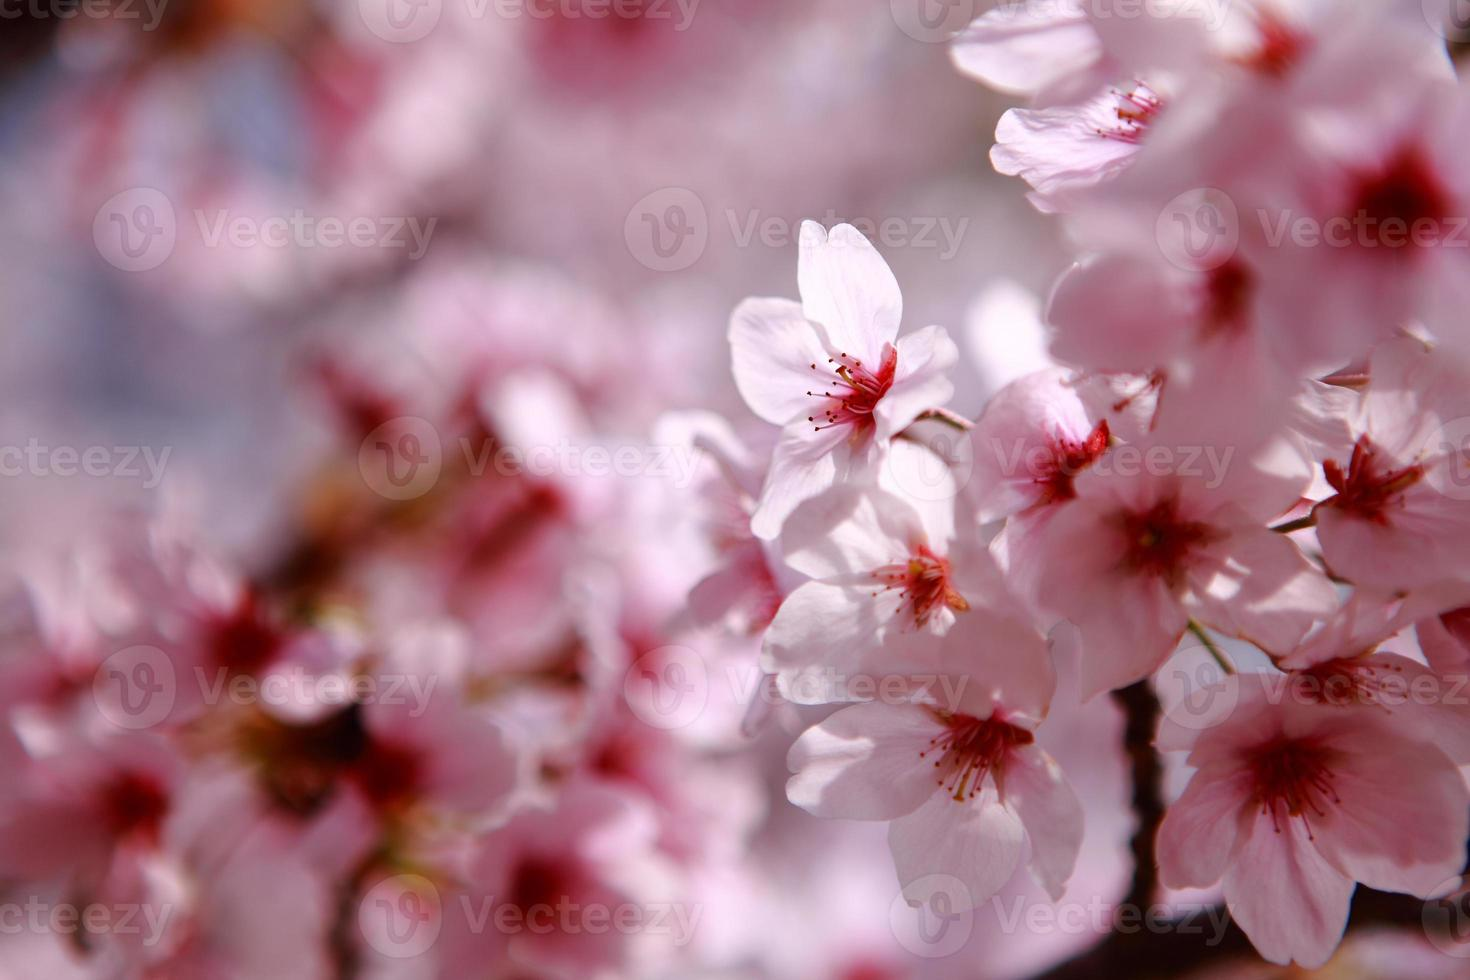 mooie roze kersenbloesem geschoten in japan foto